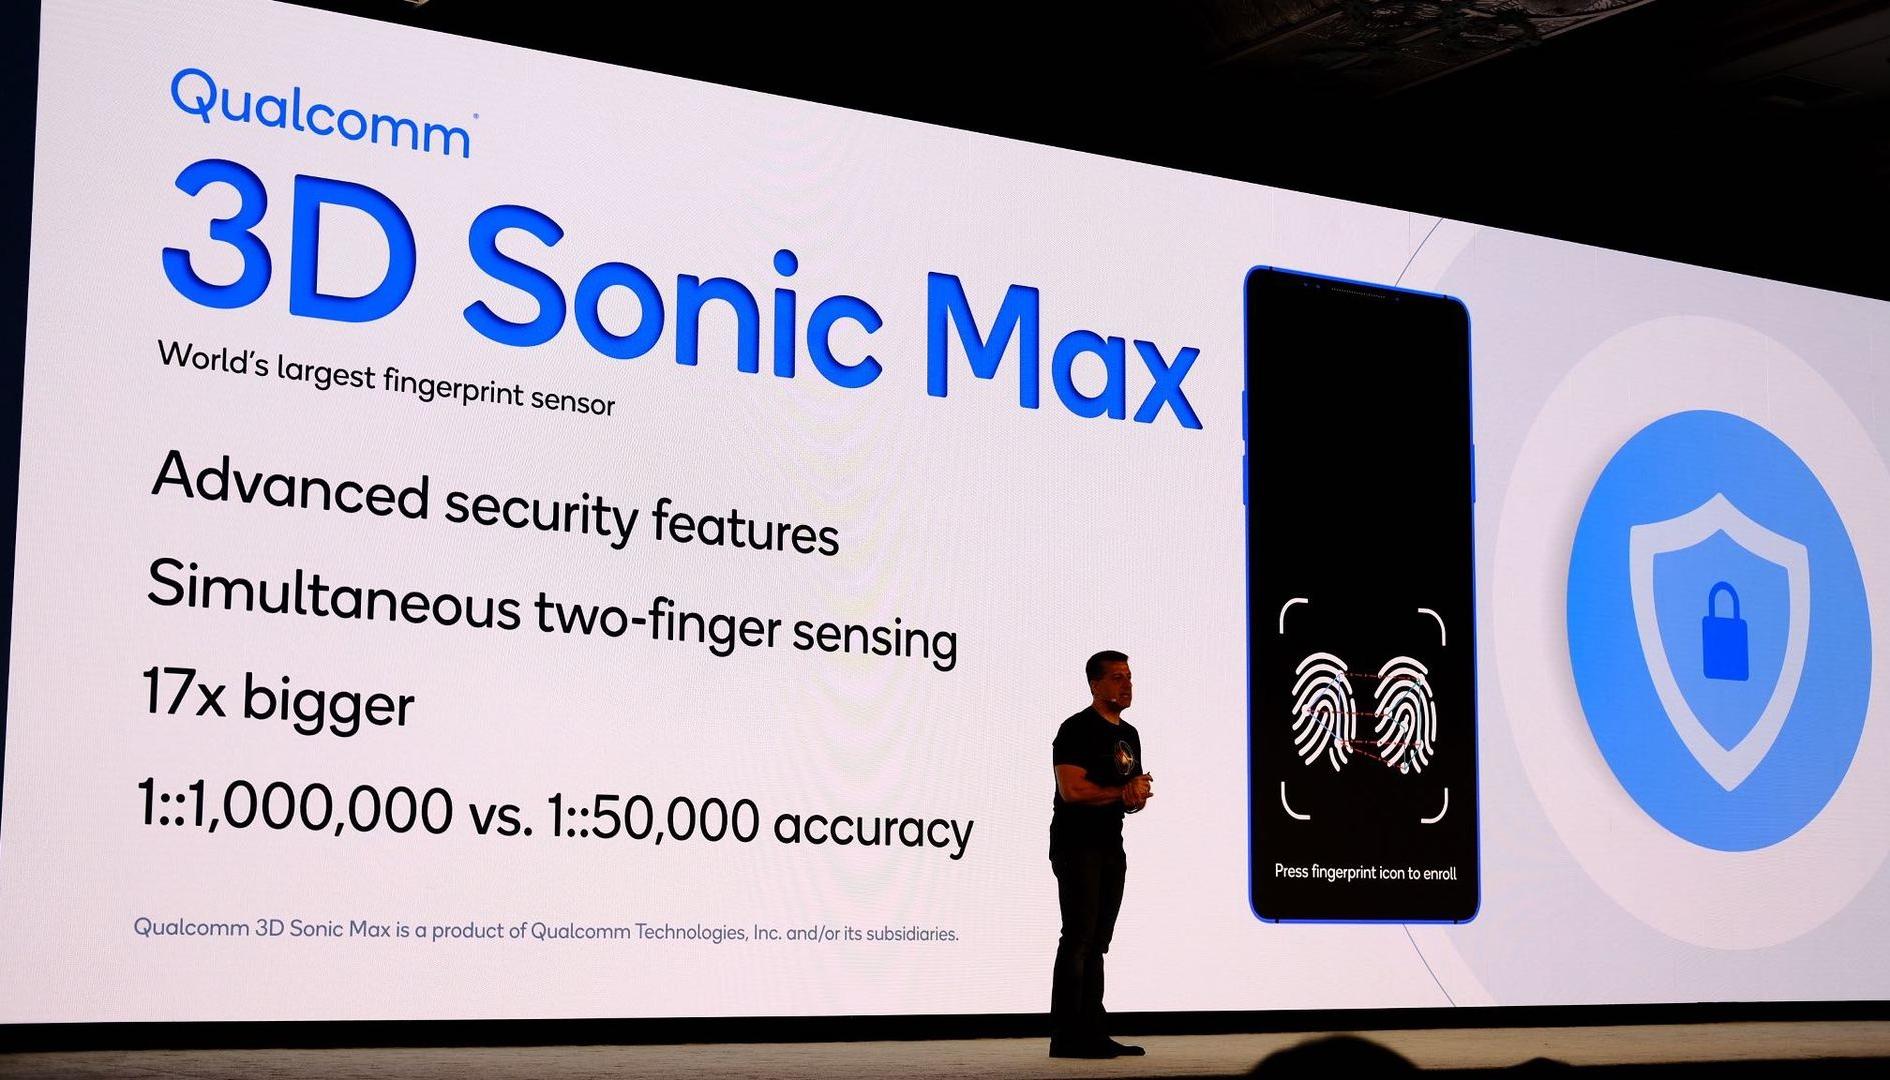 Qualcomm rivoluziona i sensori di impronte digitali per gli smartphone